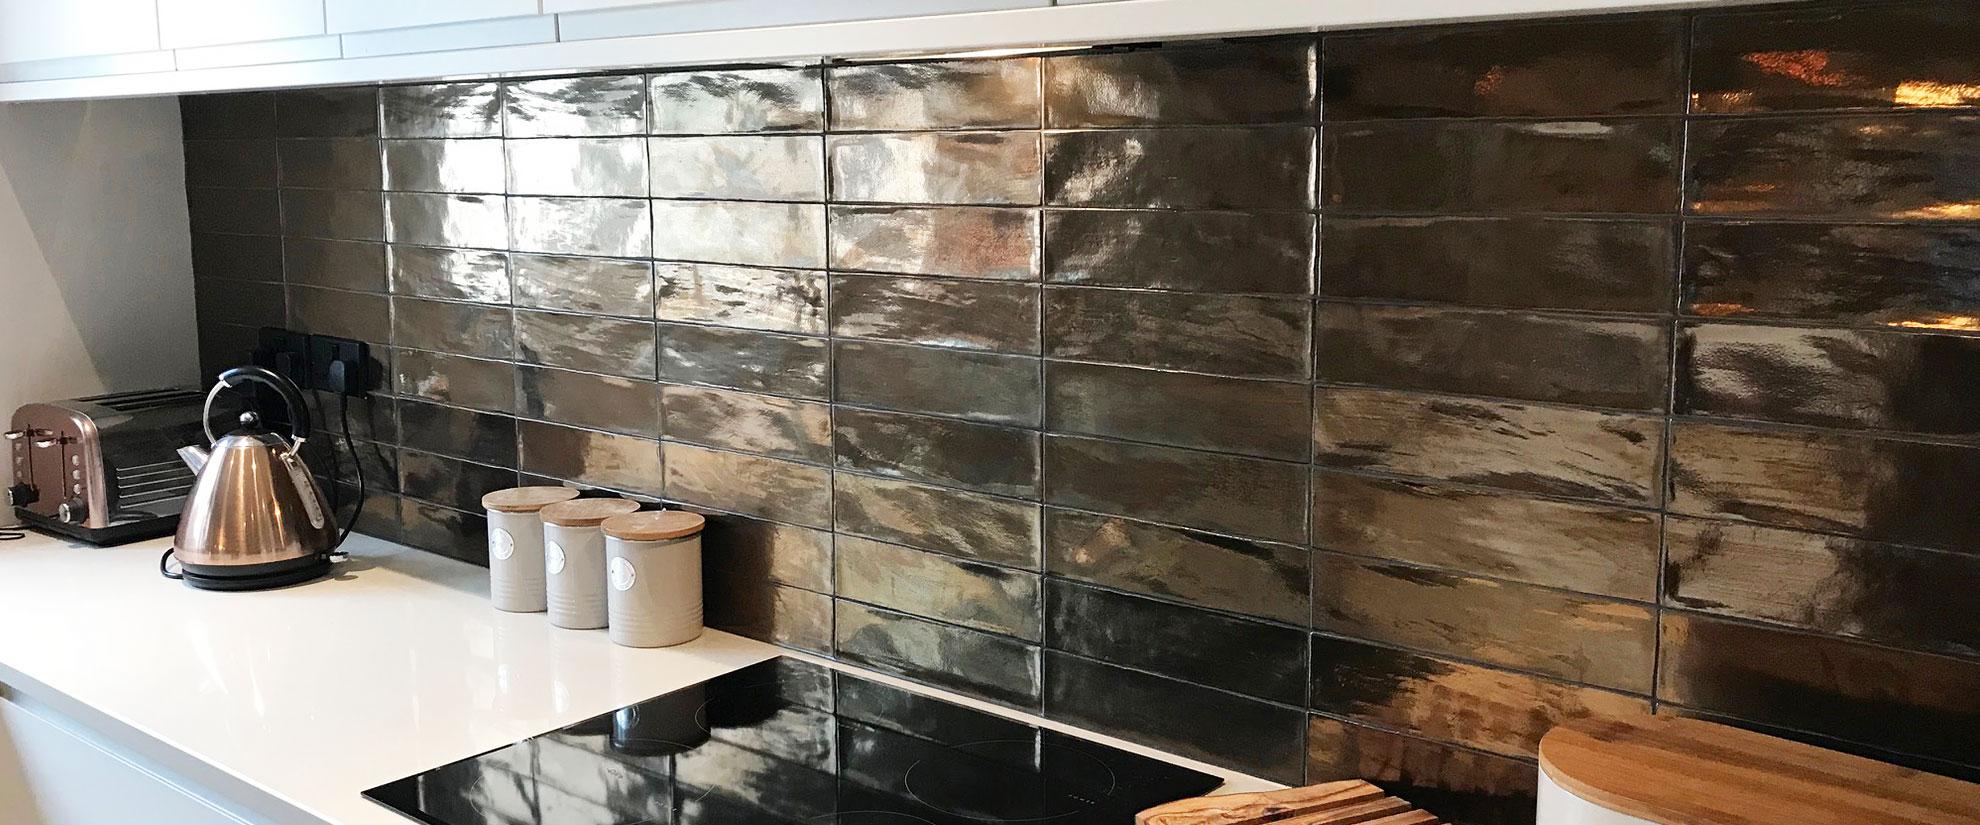 Fi Metallic Kitchen Makeover British Ceramic Tile